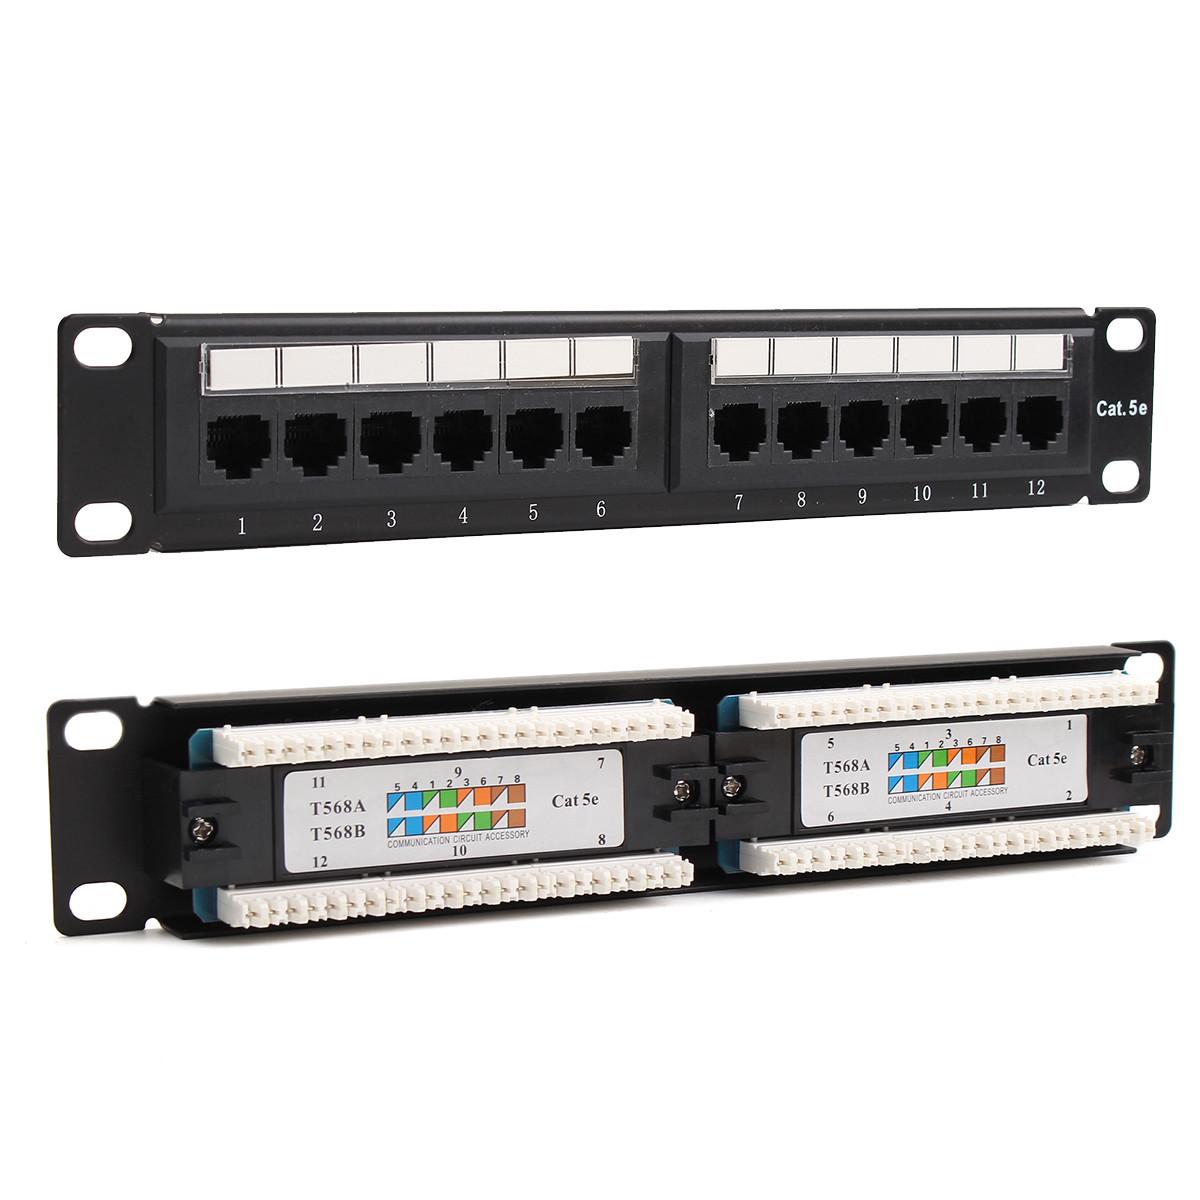 12 Port Cat6 Cat5 RJ45 Patch Panel Ethernet Network Rack Wall Mounted Bracket